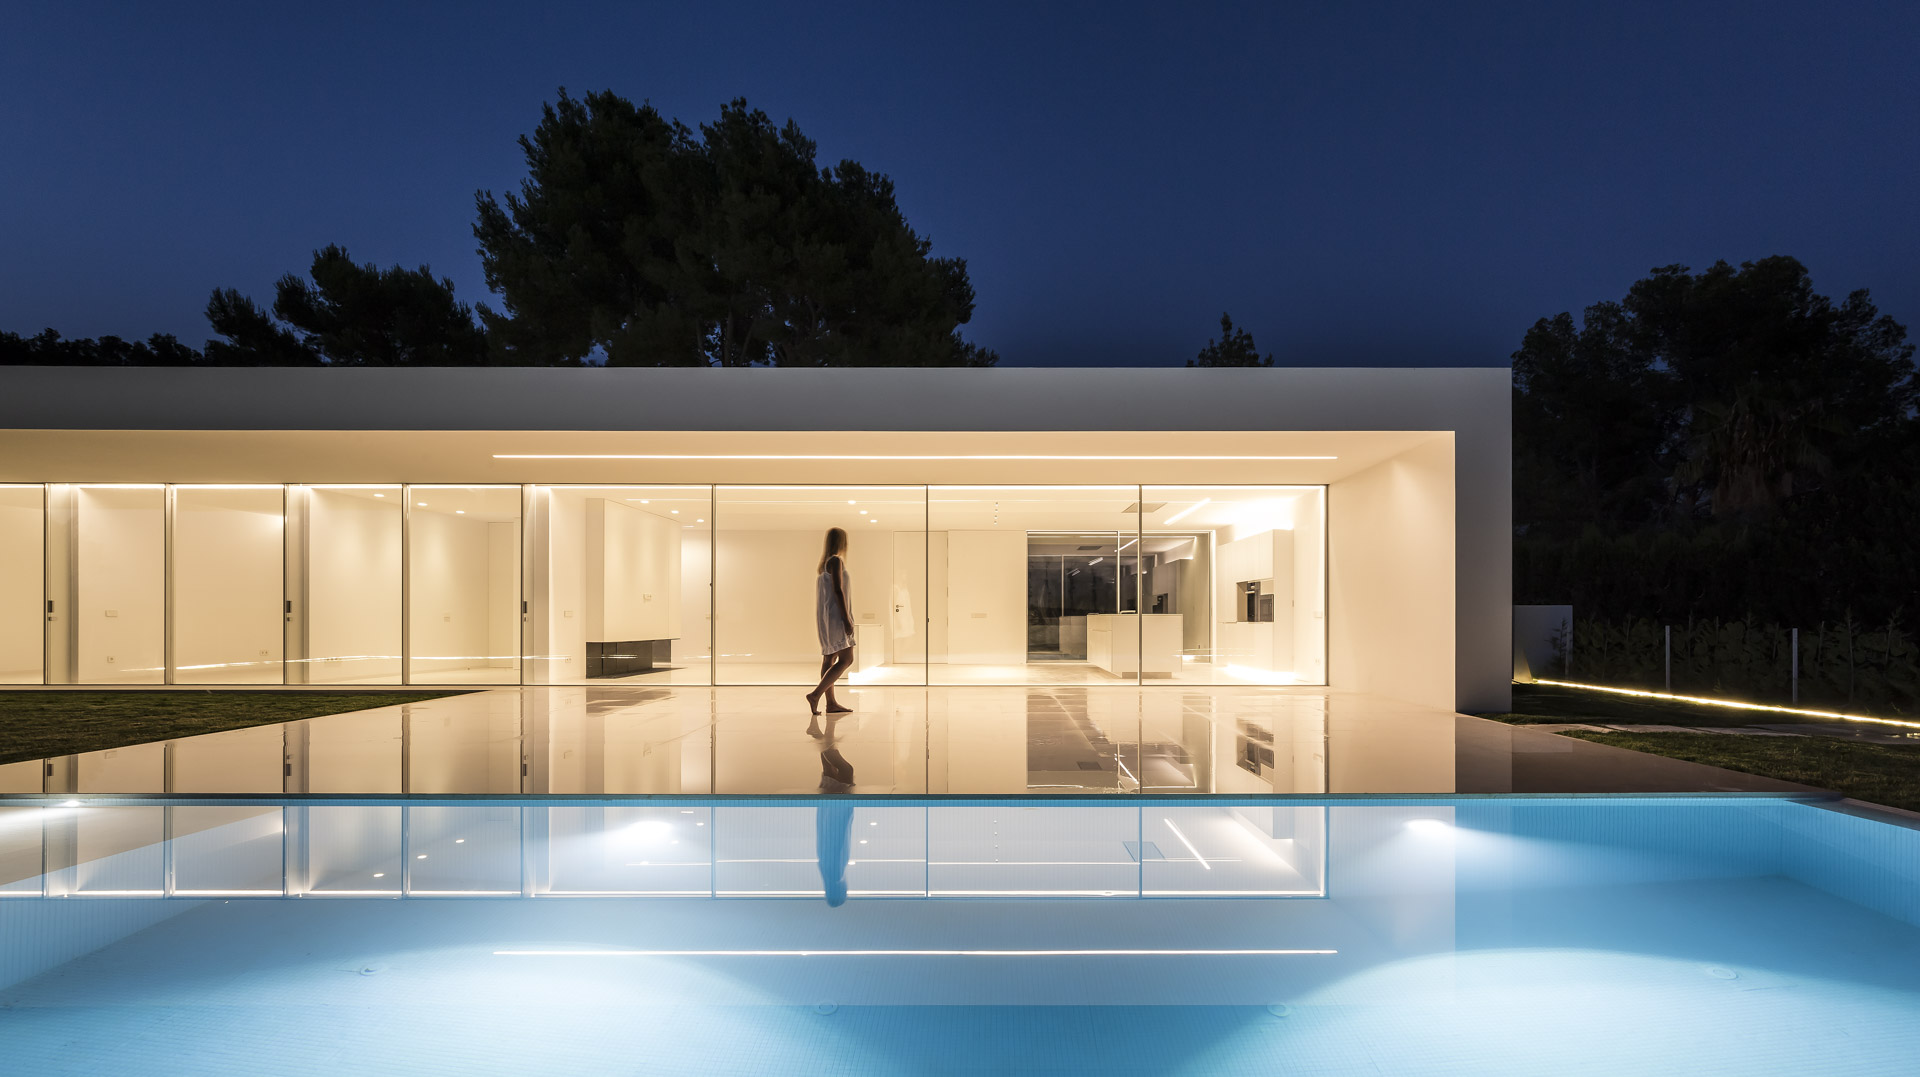 fotografia-arquitectura-valencia-german-cabo-gallardo-llopis-villamarchante-vivienda-63